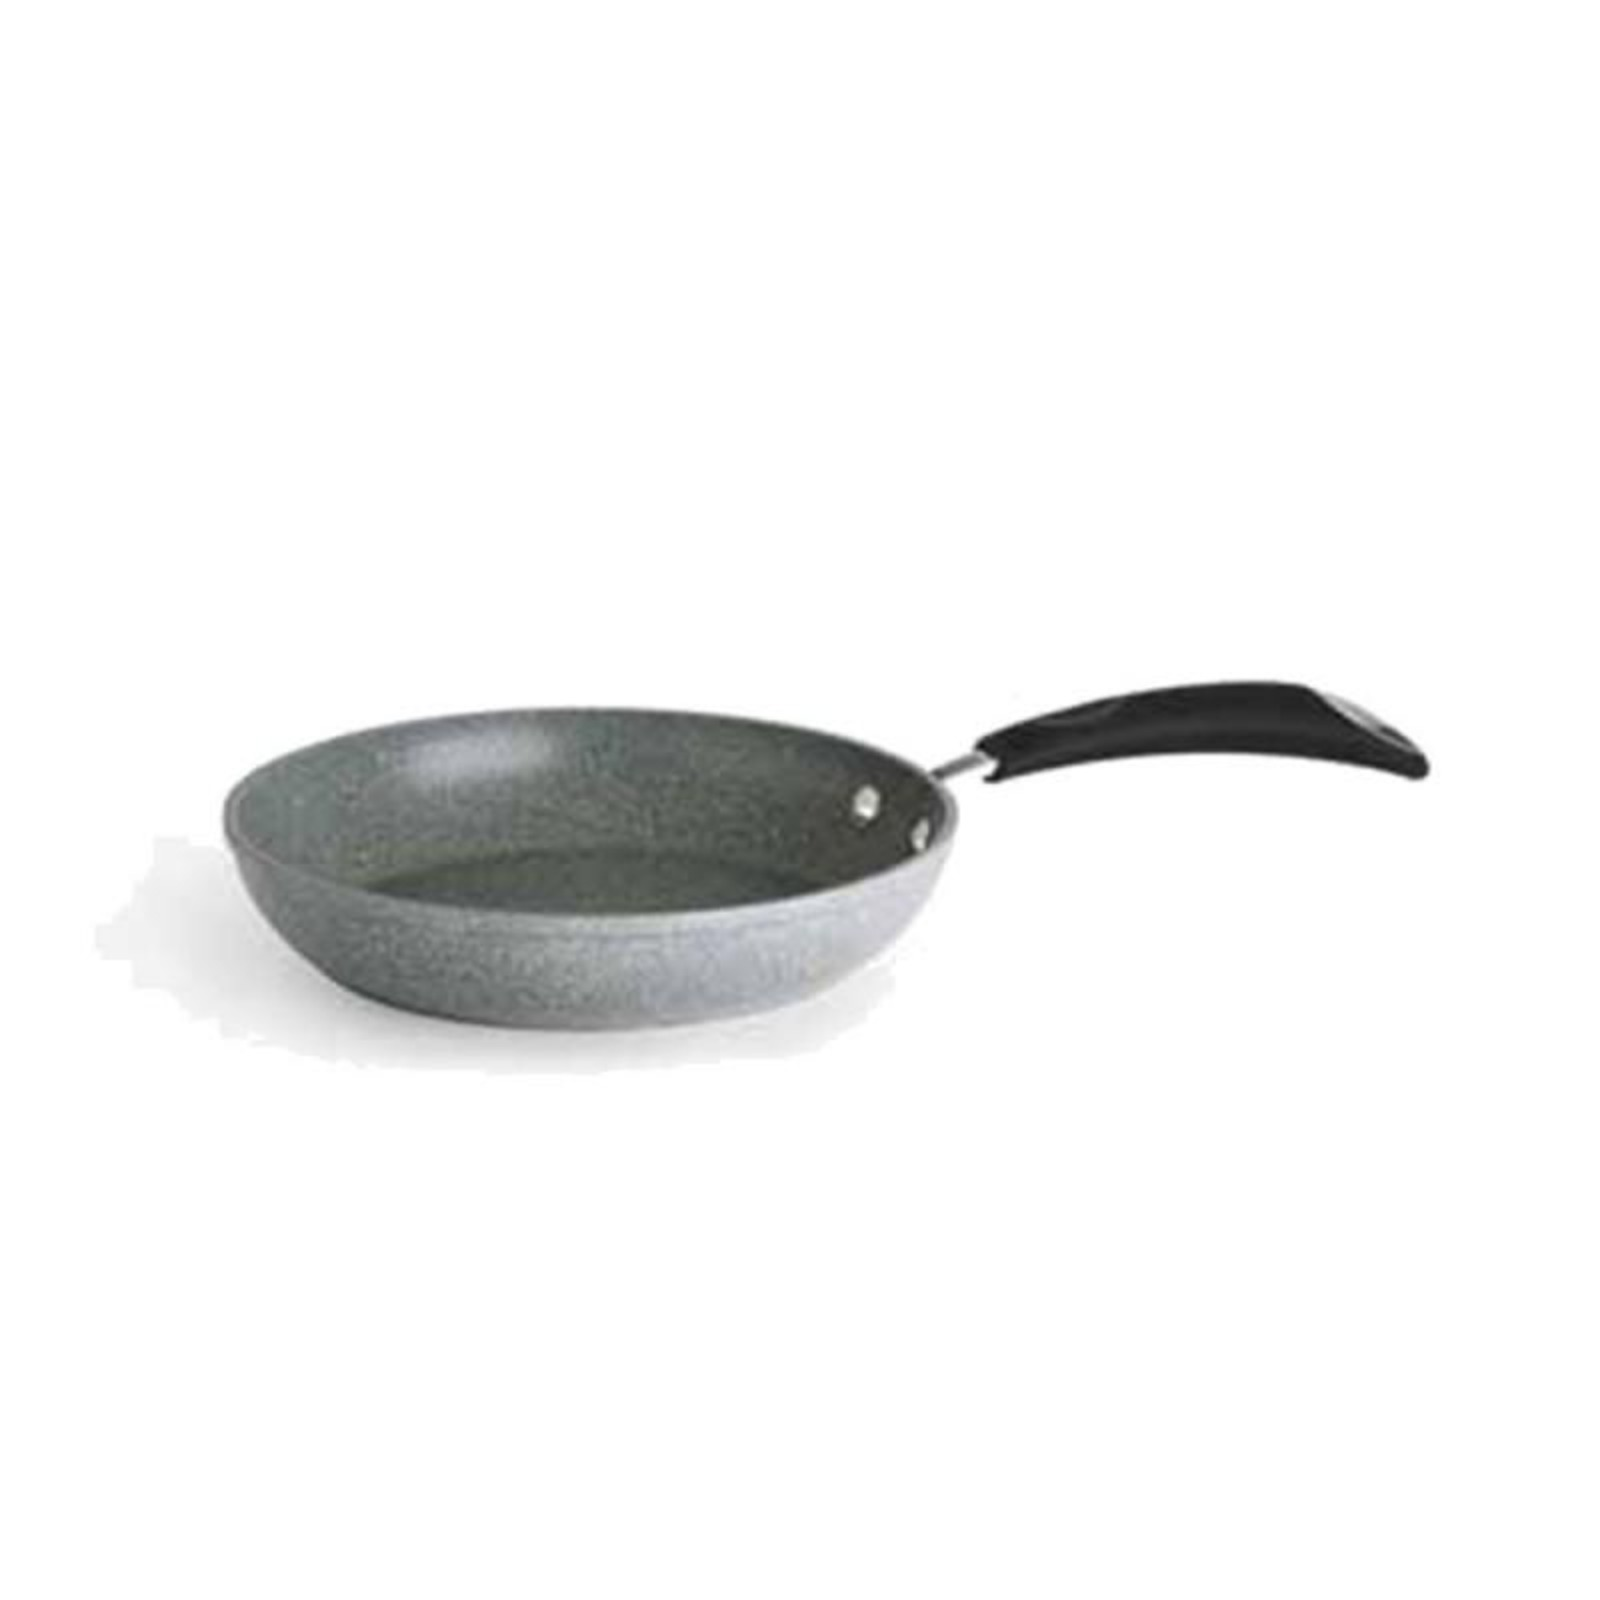 Bialetti Petravera Fry Pan